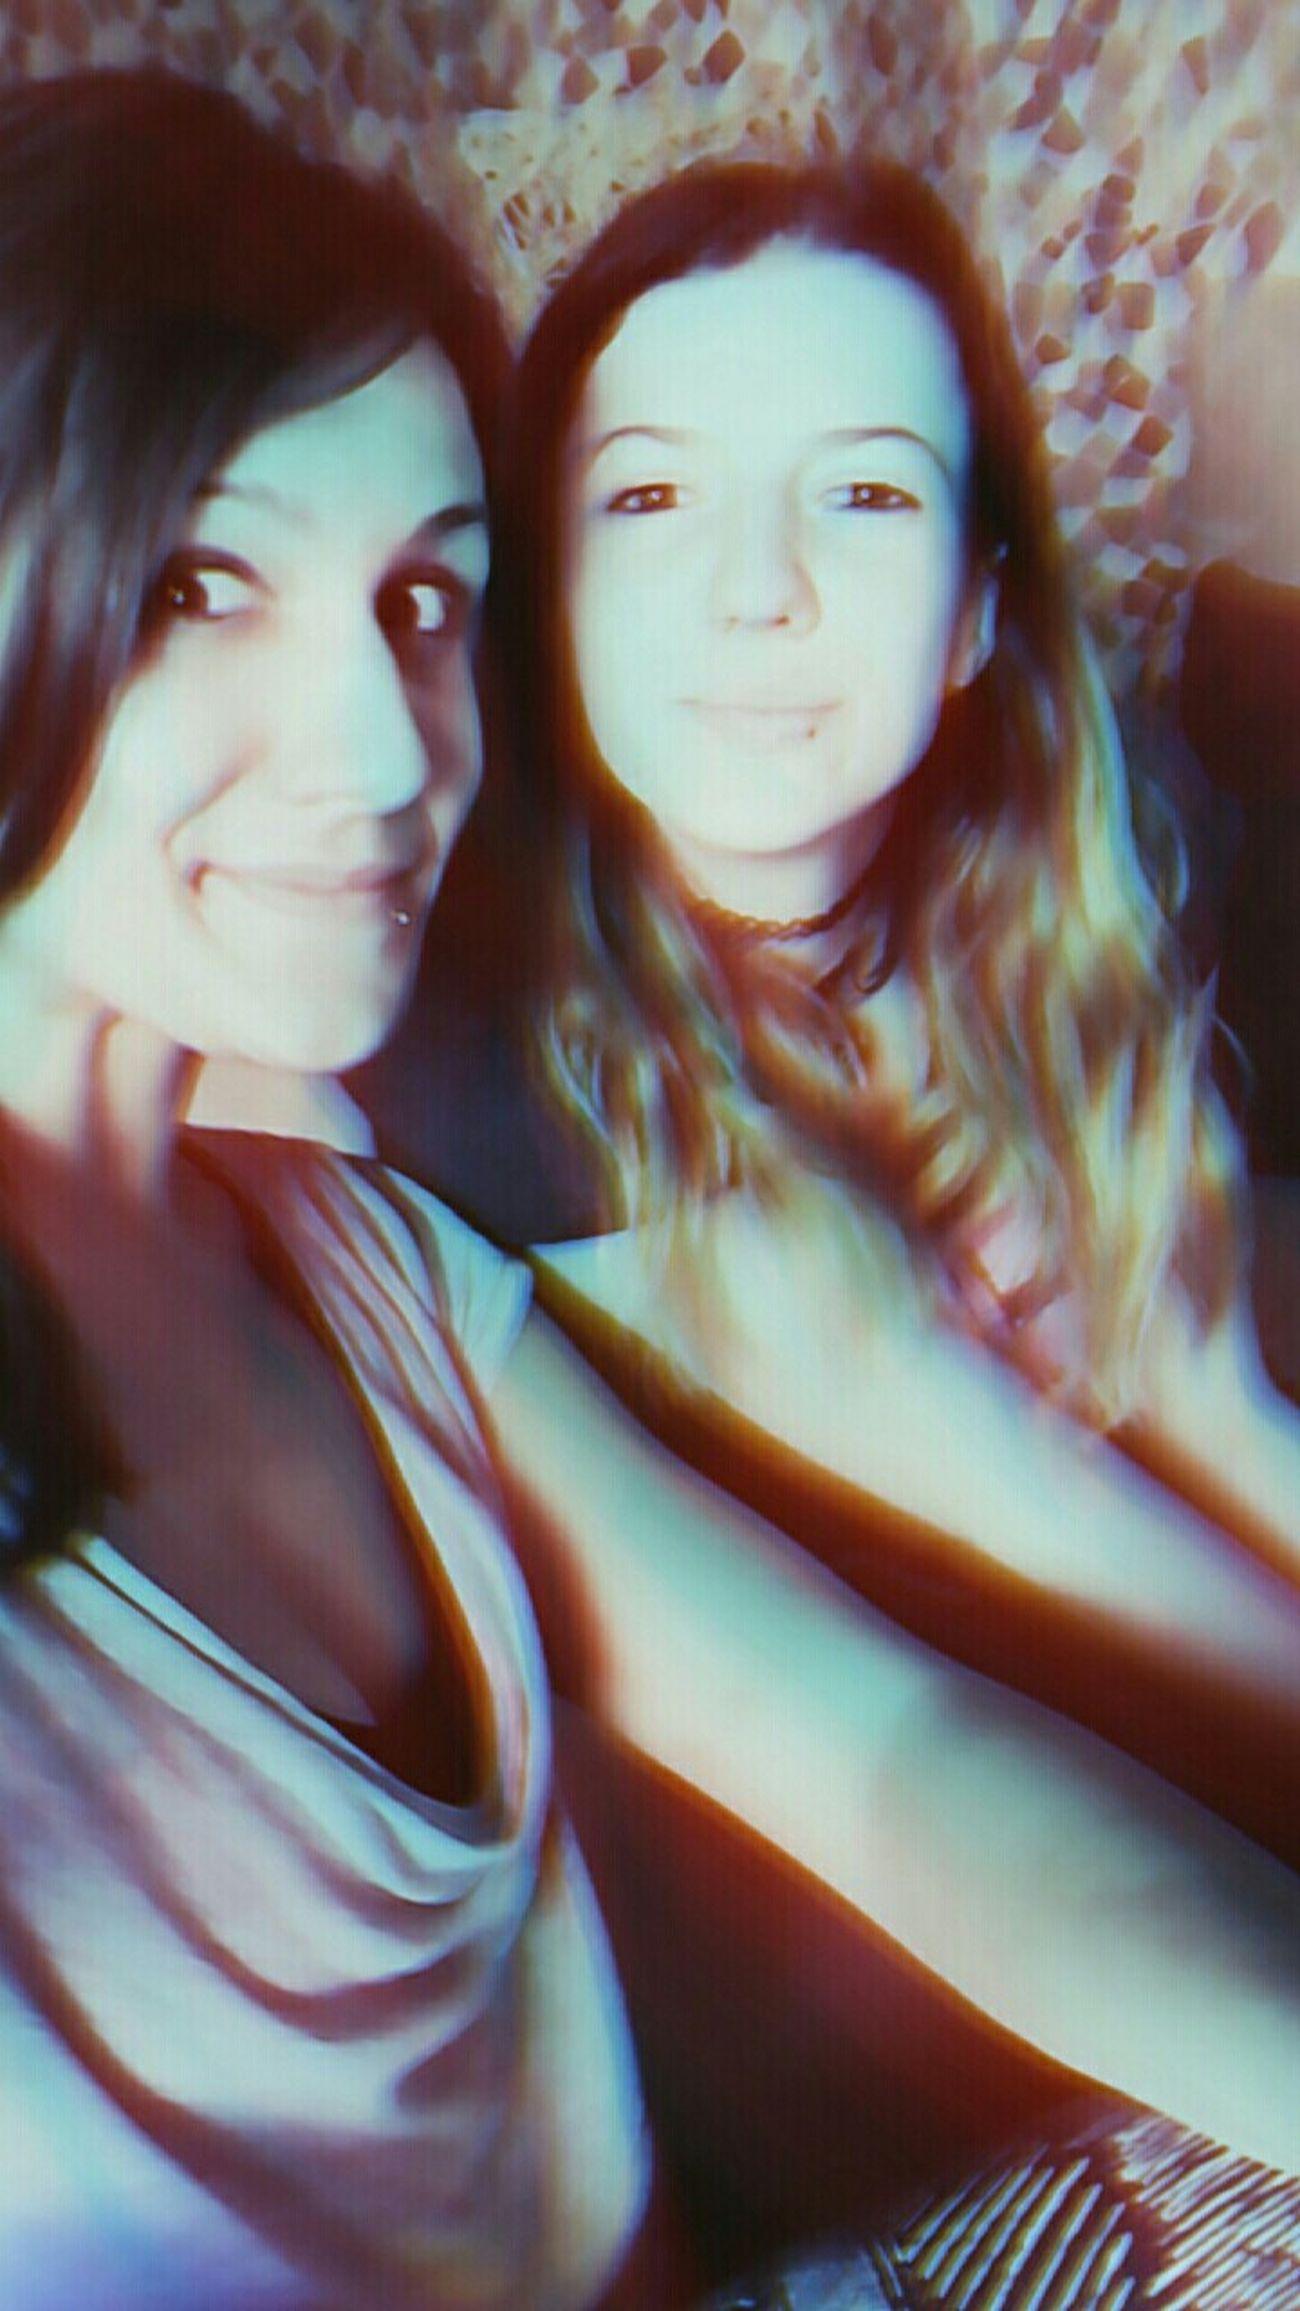 Inagutschii Happy Love♥ Brown Eyes Women Brown Hair Selfie ♥ Mylife♡ Hasiihase Friendship Happiness Have A Nice Day♥ Two People Keep Smiling Selfie Time Friendship ❤ Lieblingsmensch Ladies HerzMenschen Beautiful ♥